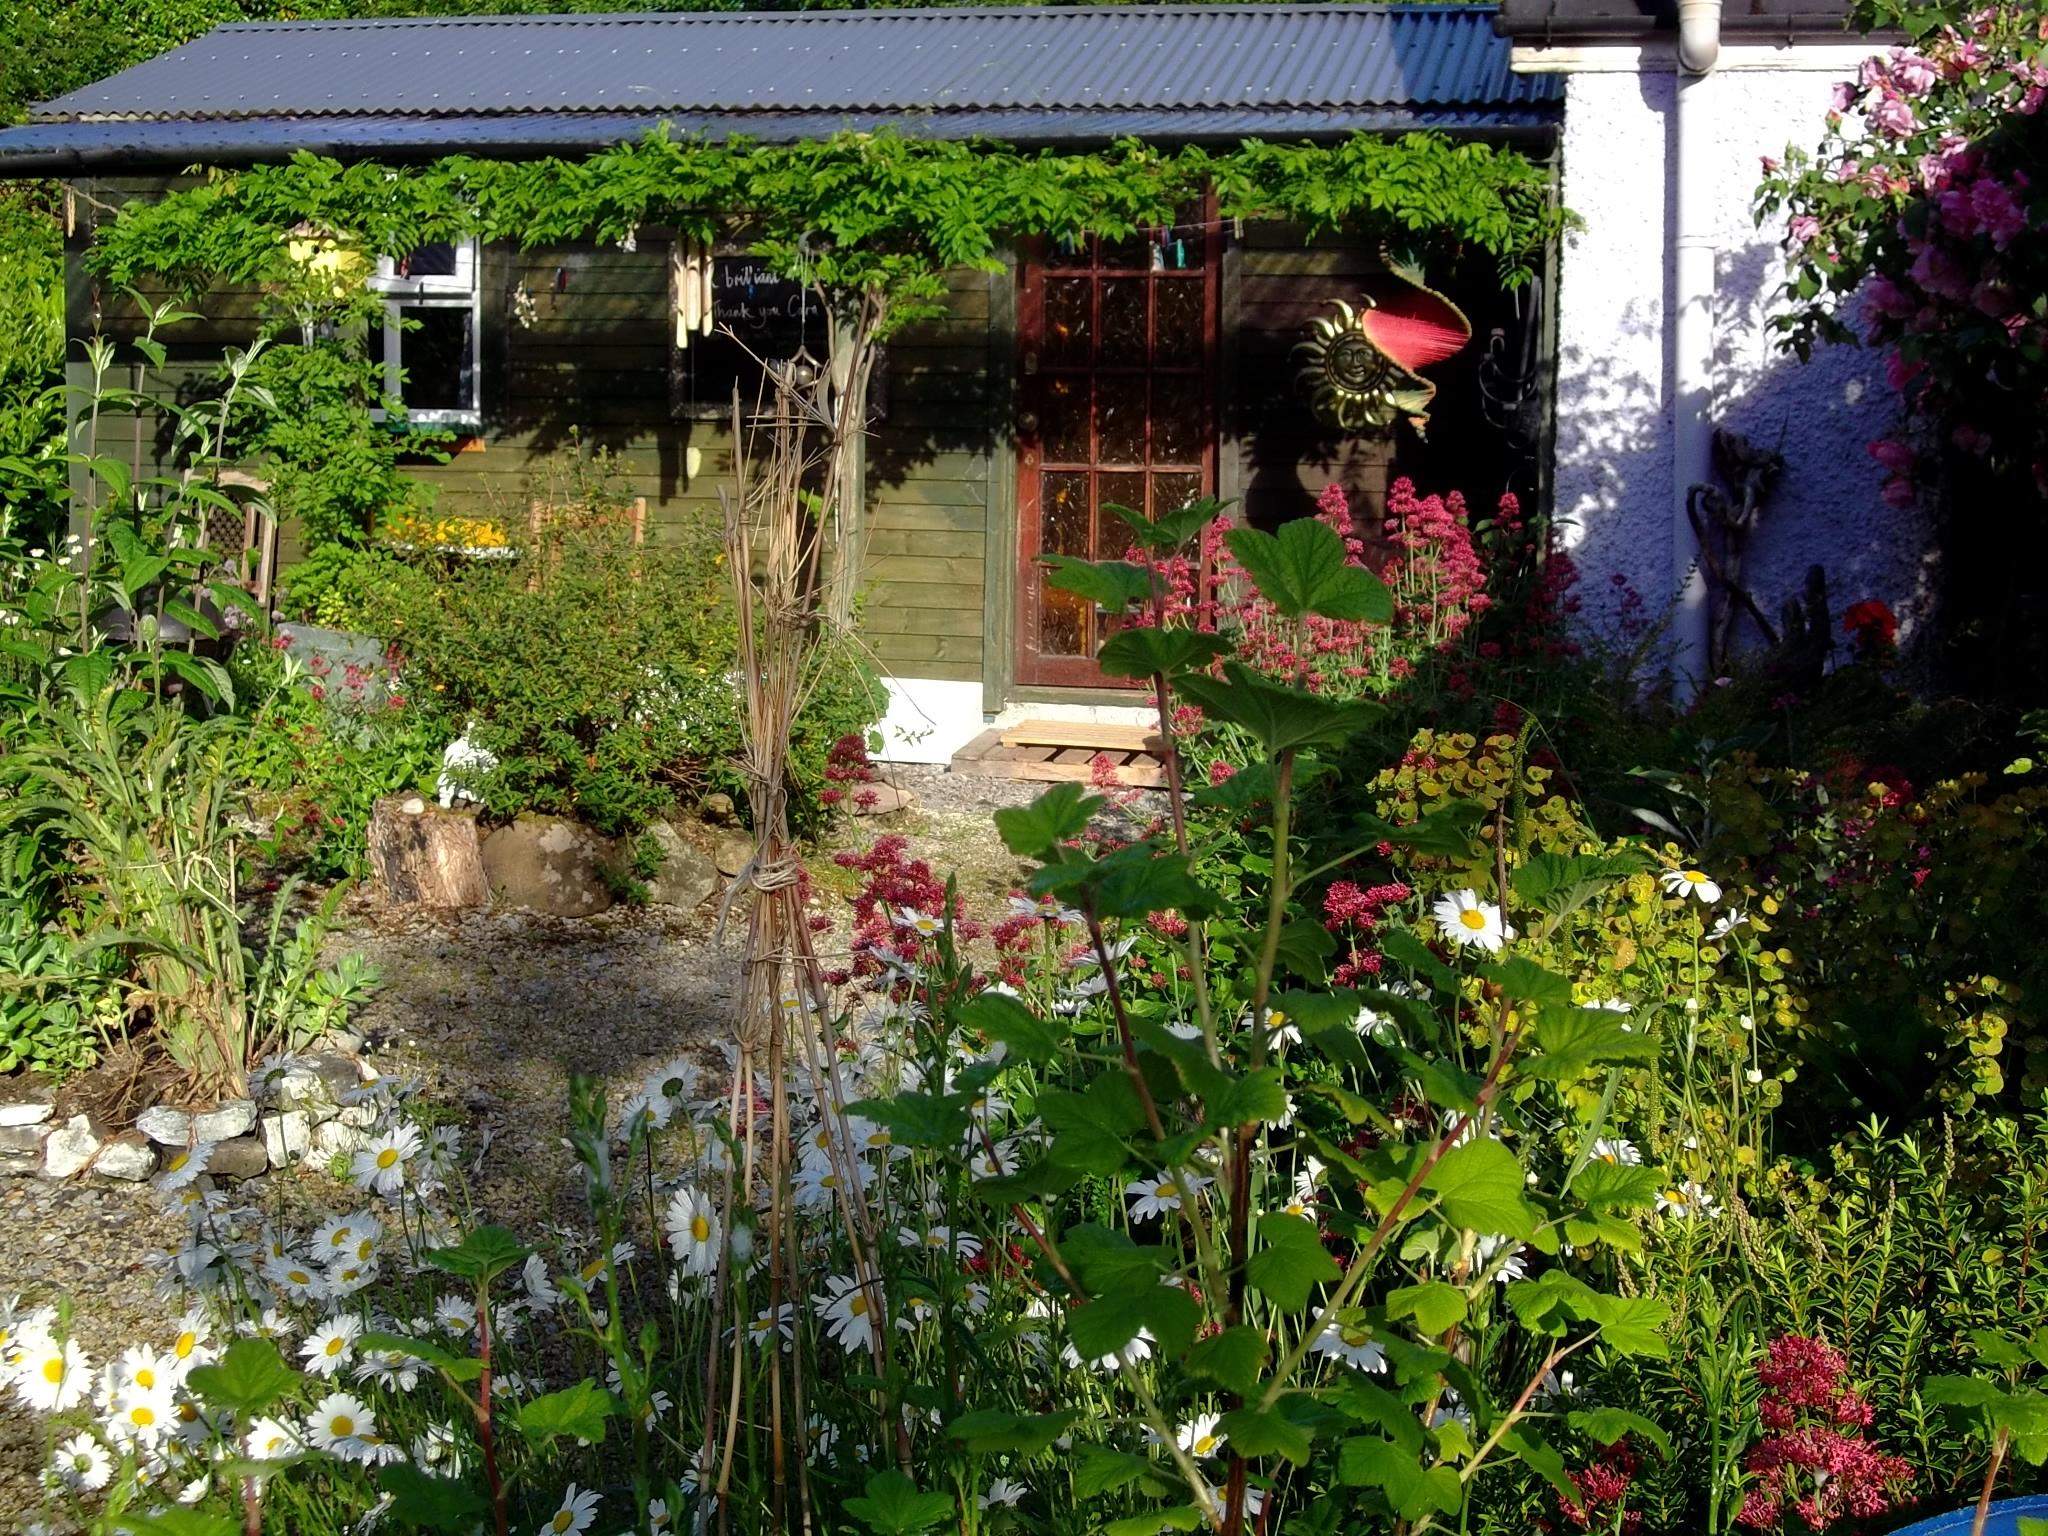 Bealtaine Lodge on Midsummer morning